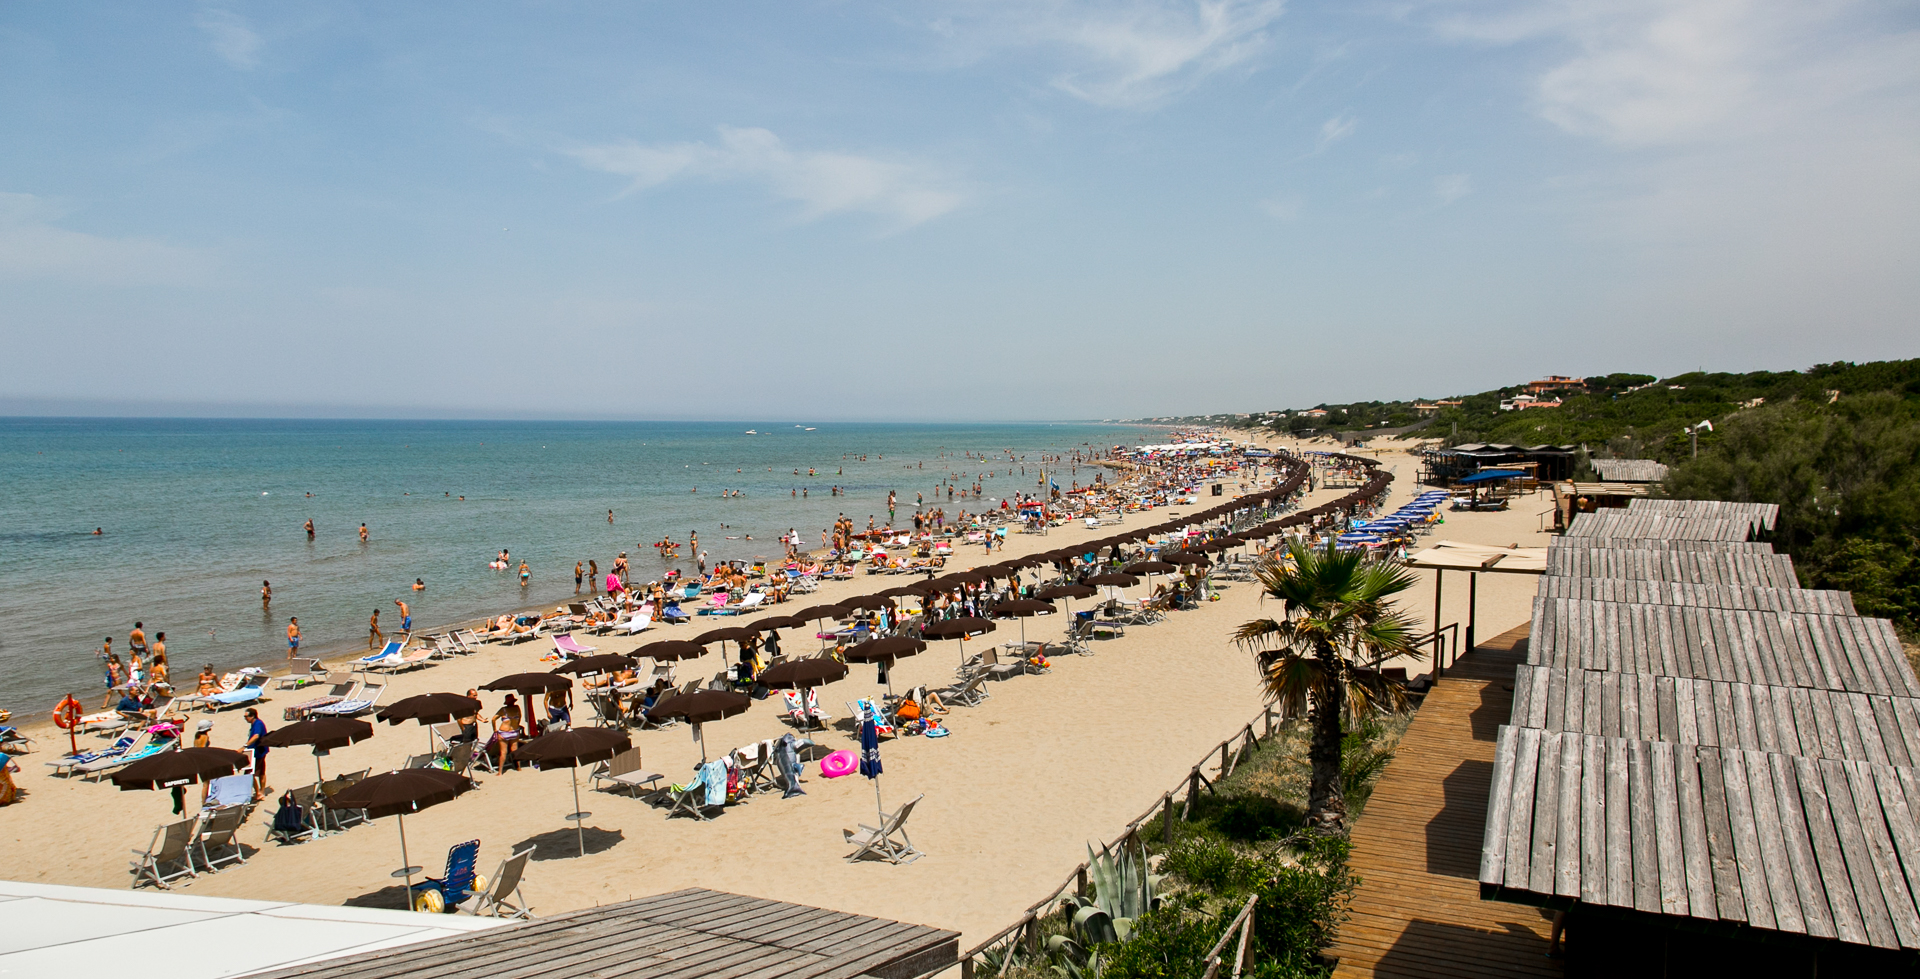 Matrimonio Spiaggia Sabaudia : Spiaggia di sabaudia latina trovaspiagge portale